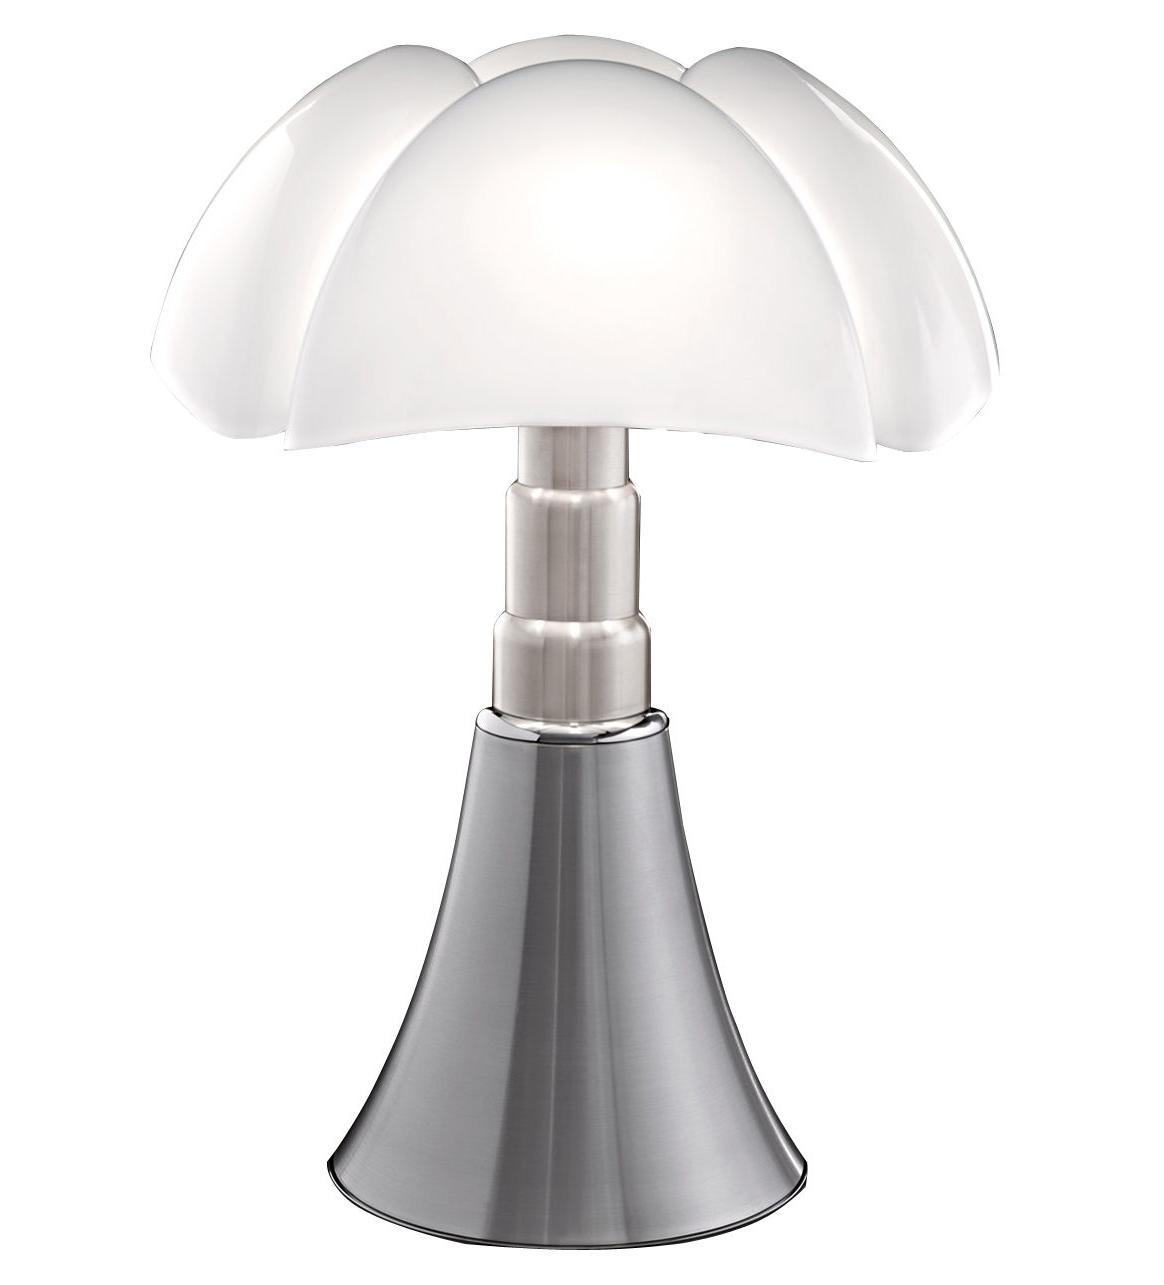 Lampe à poser PIPISTRELLO de Martinelli Luce, Aluminium satiné f2c5d7f8d1fa